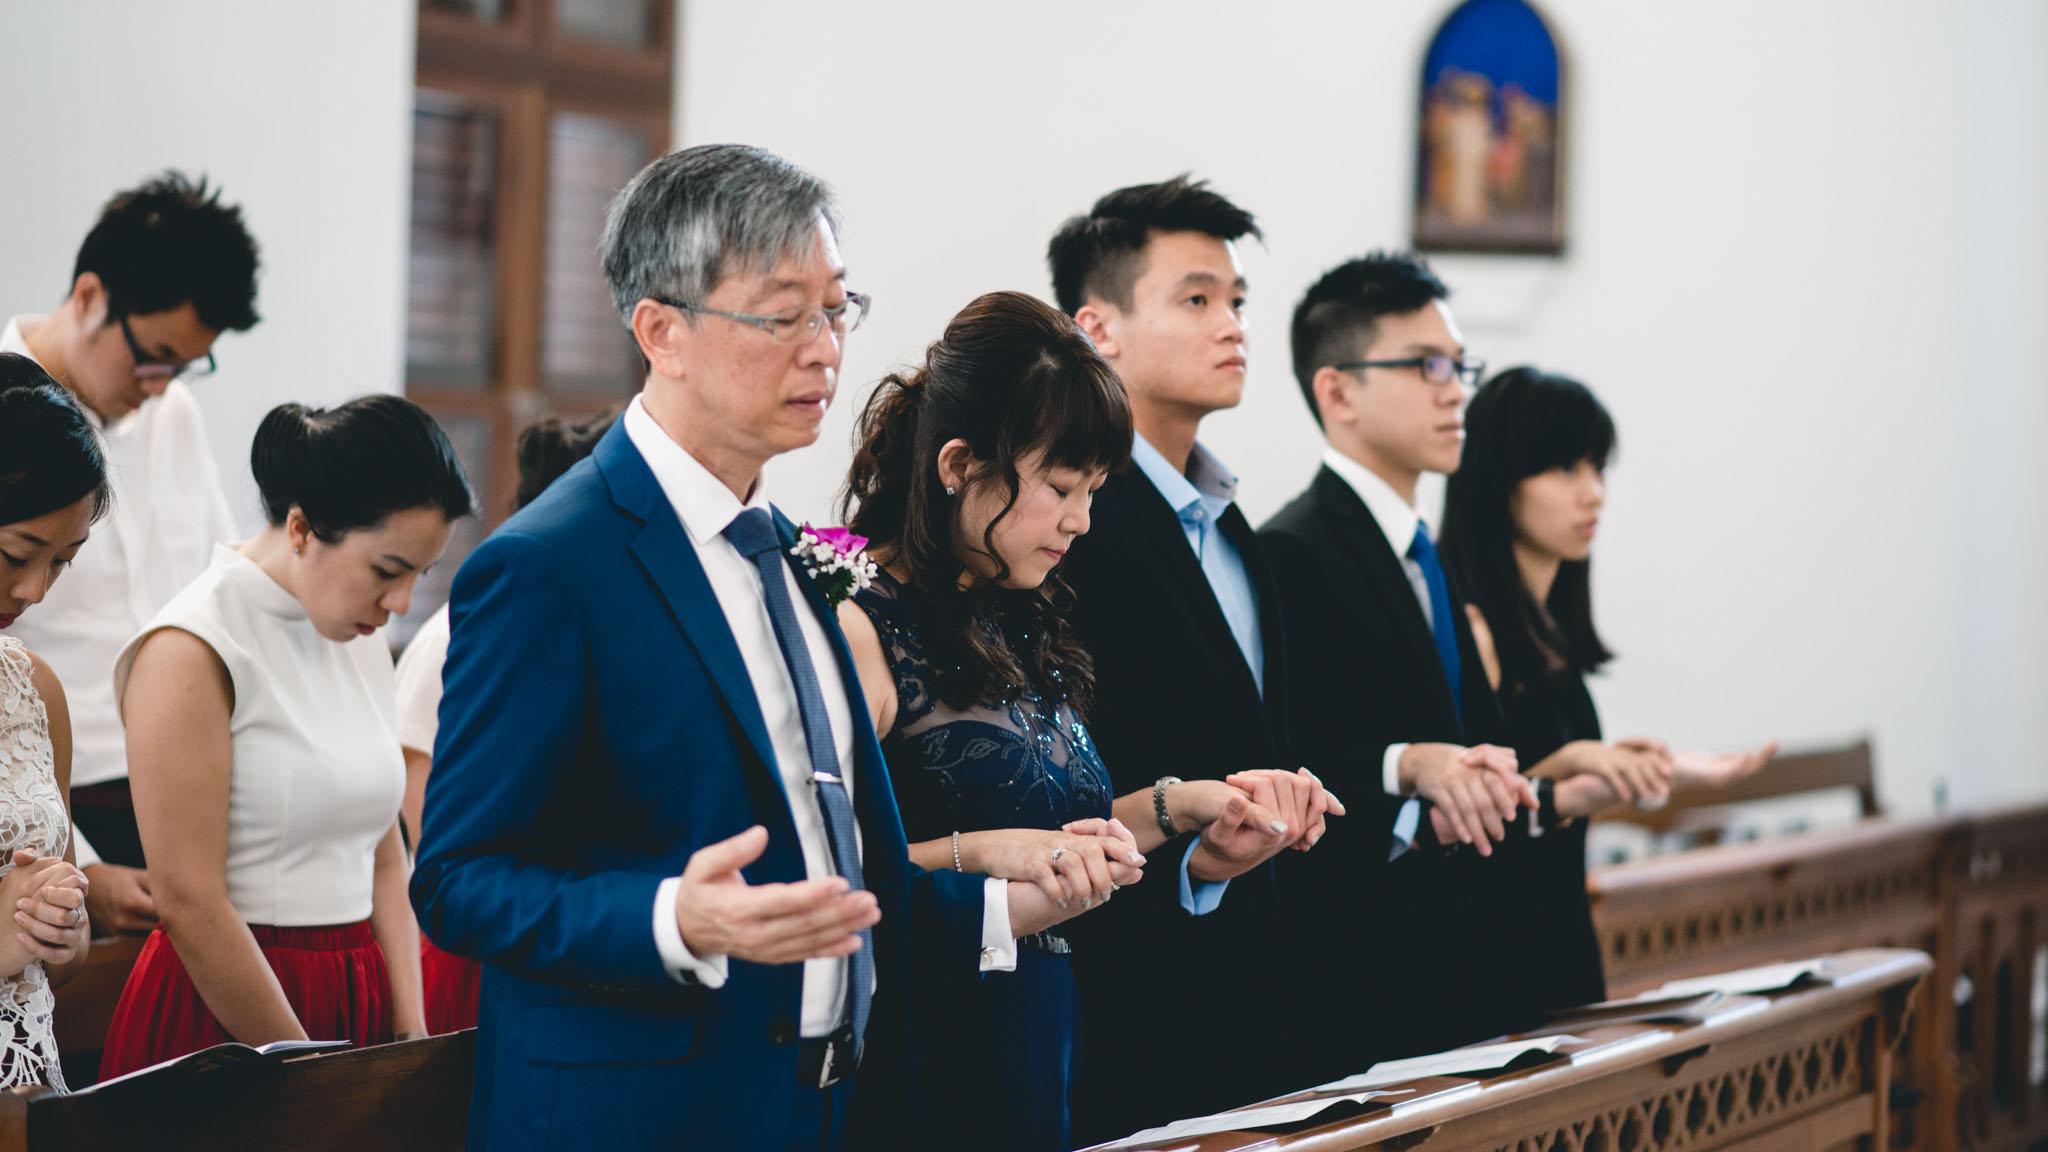 wedding church saints peter and paul 00039.JPG